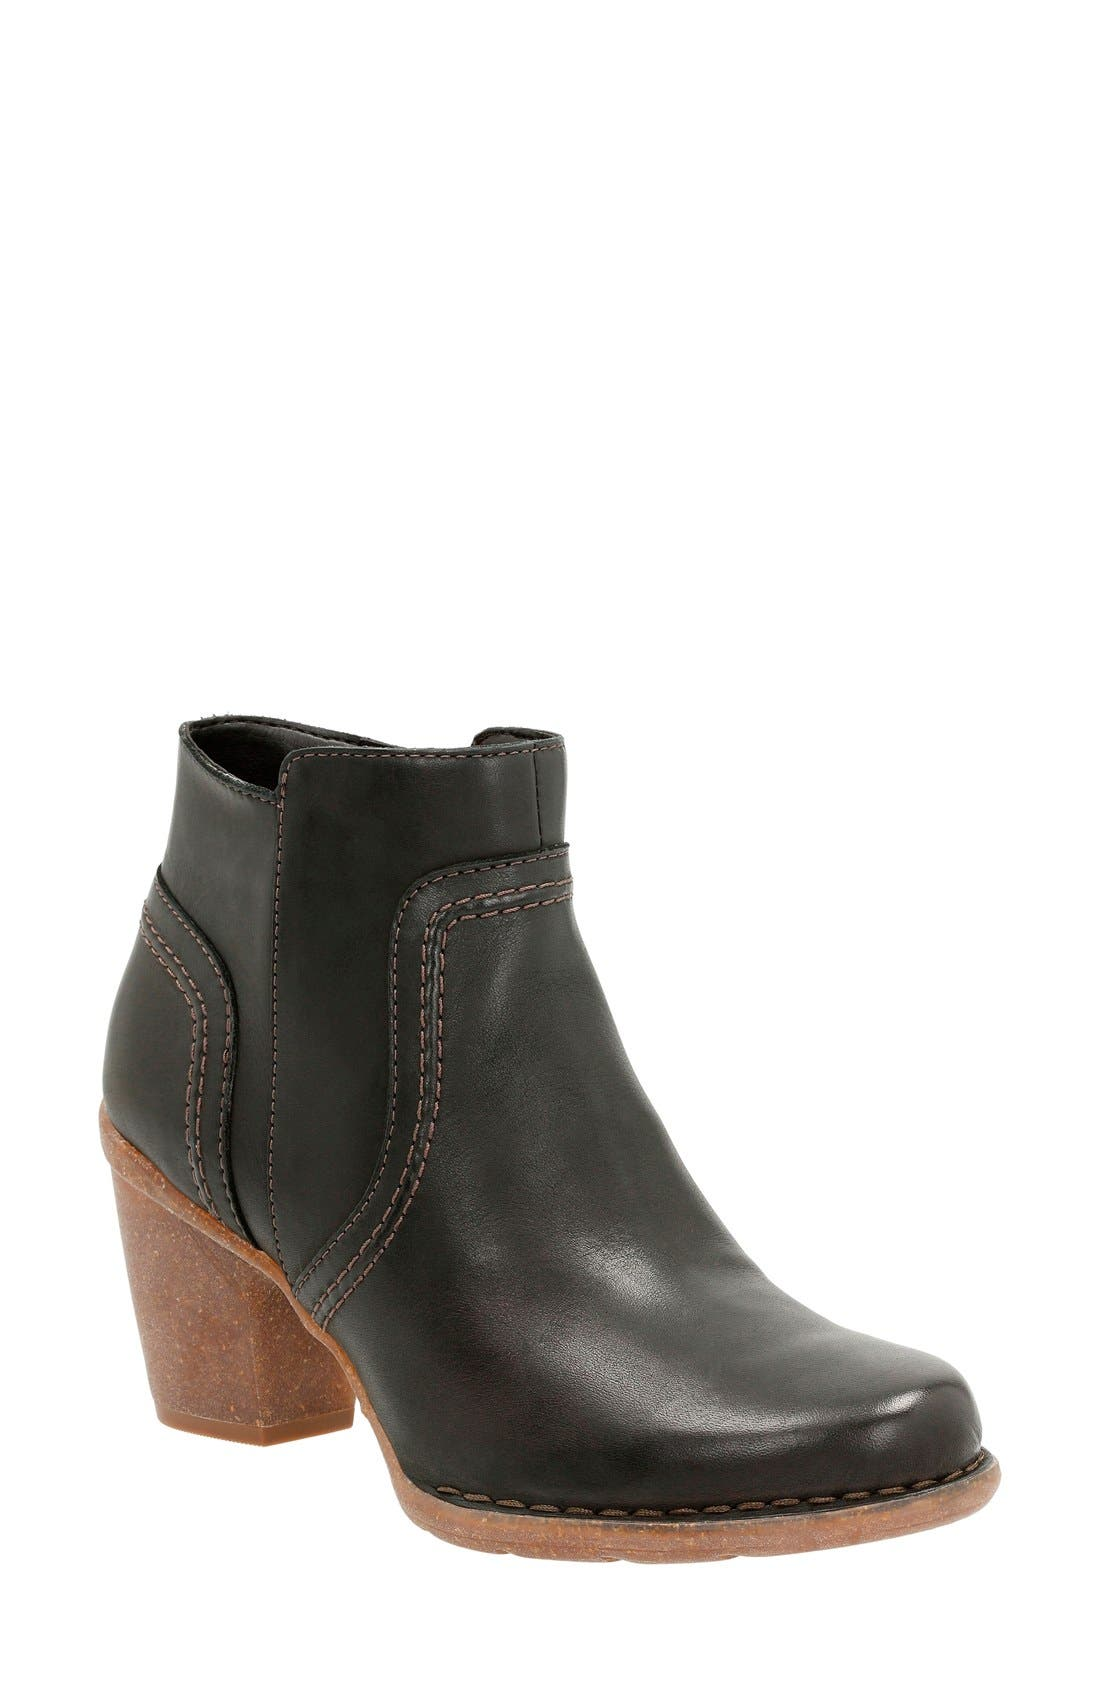 Main Image - Clarks® 'Carleta Paris' Ankle Boot (Women)